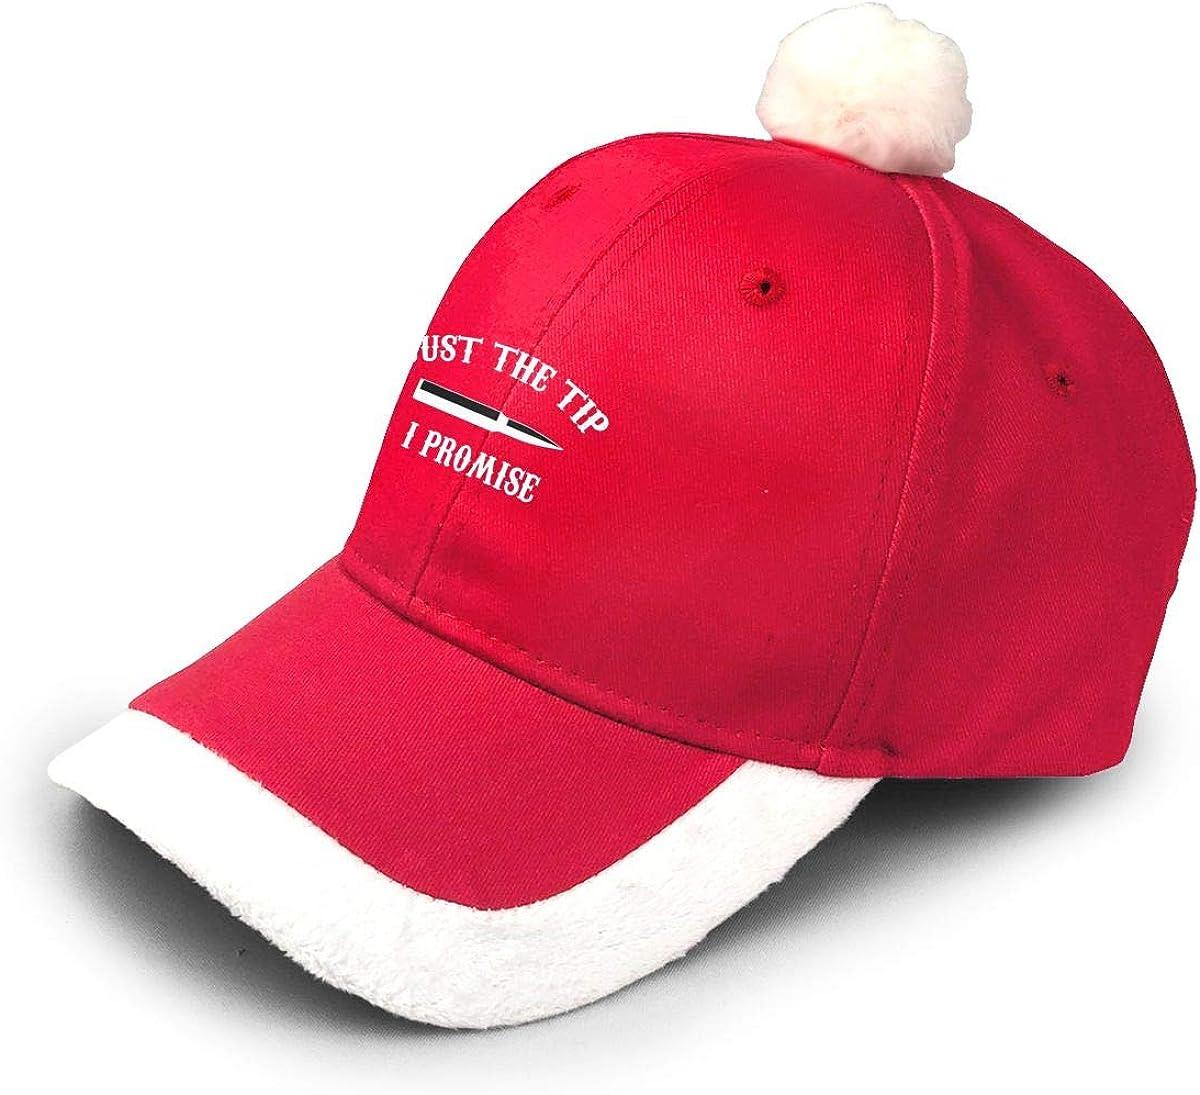 Suzen95 Just The Tip I Promise Fashionable Christmas Santa Baseball Cap|Christmas Accessory